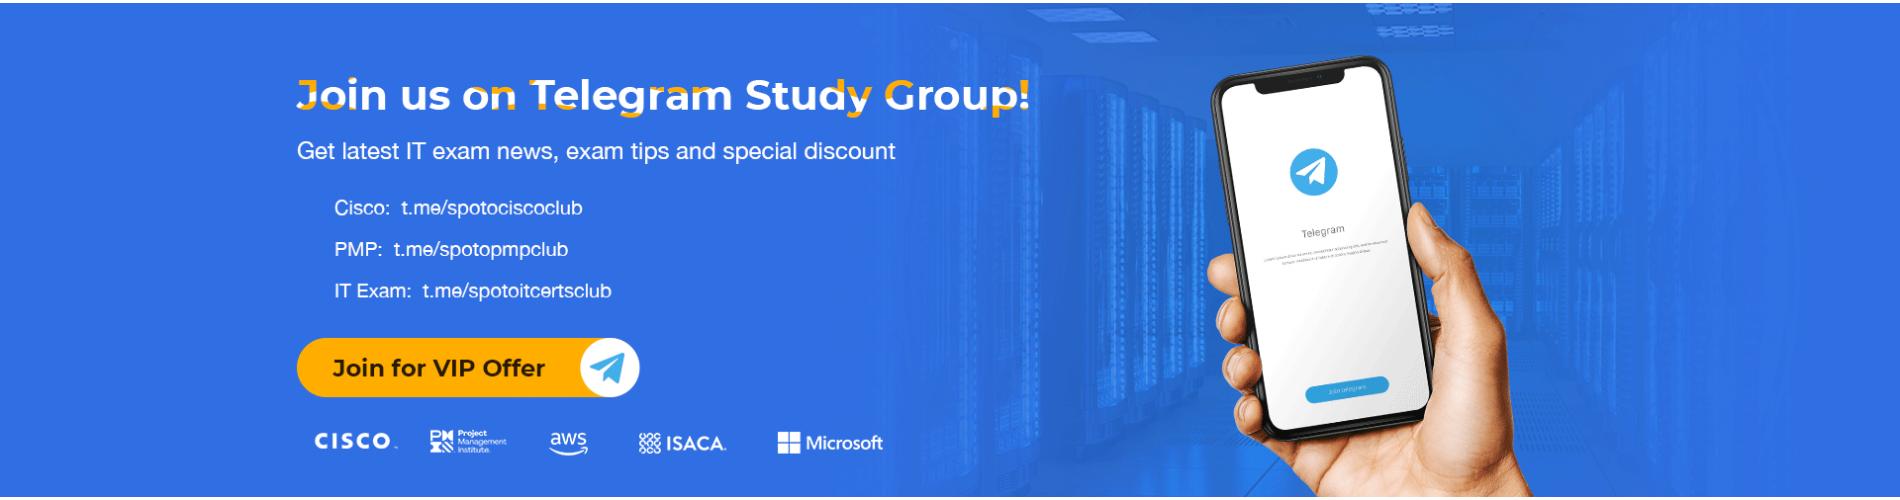 Join us on Telegram Study Group!